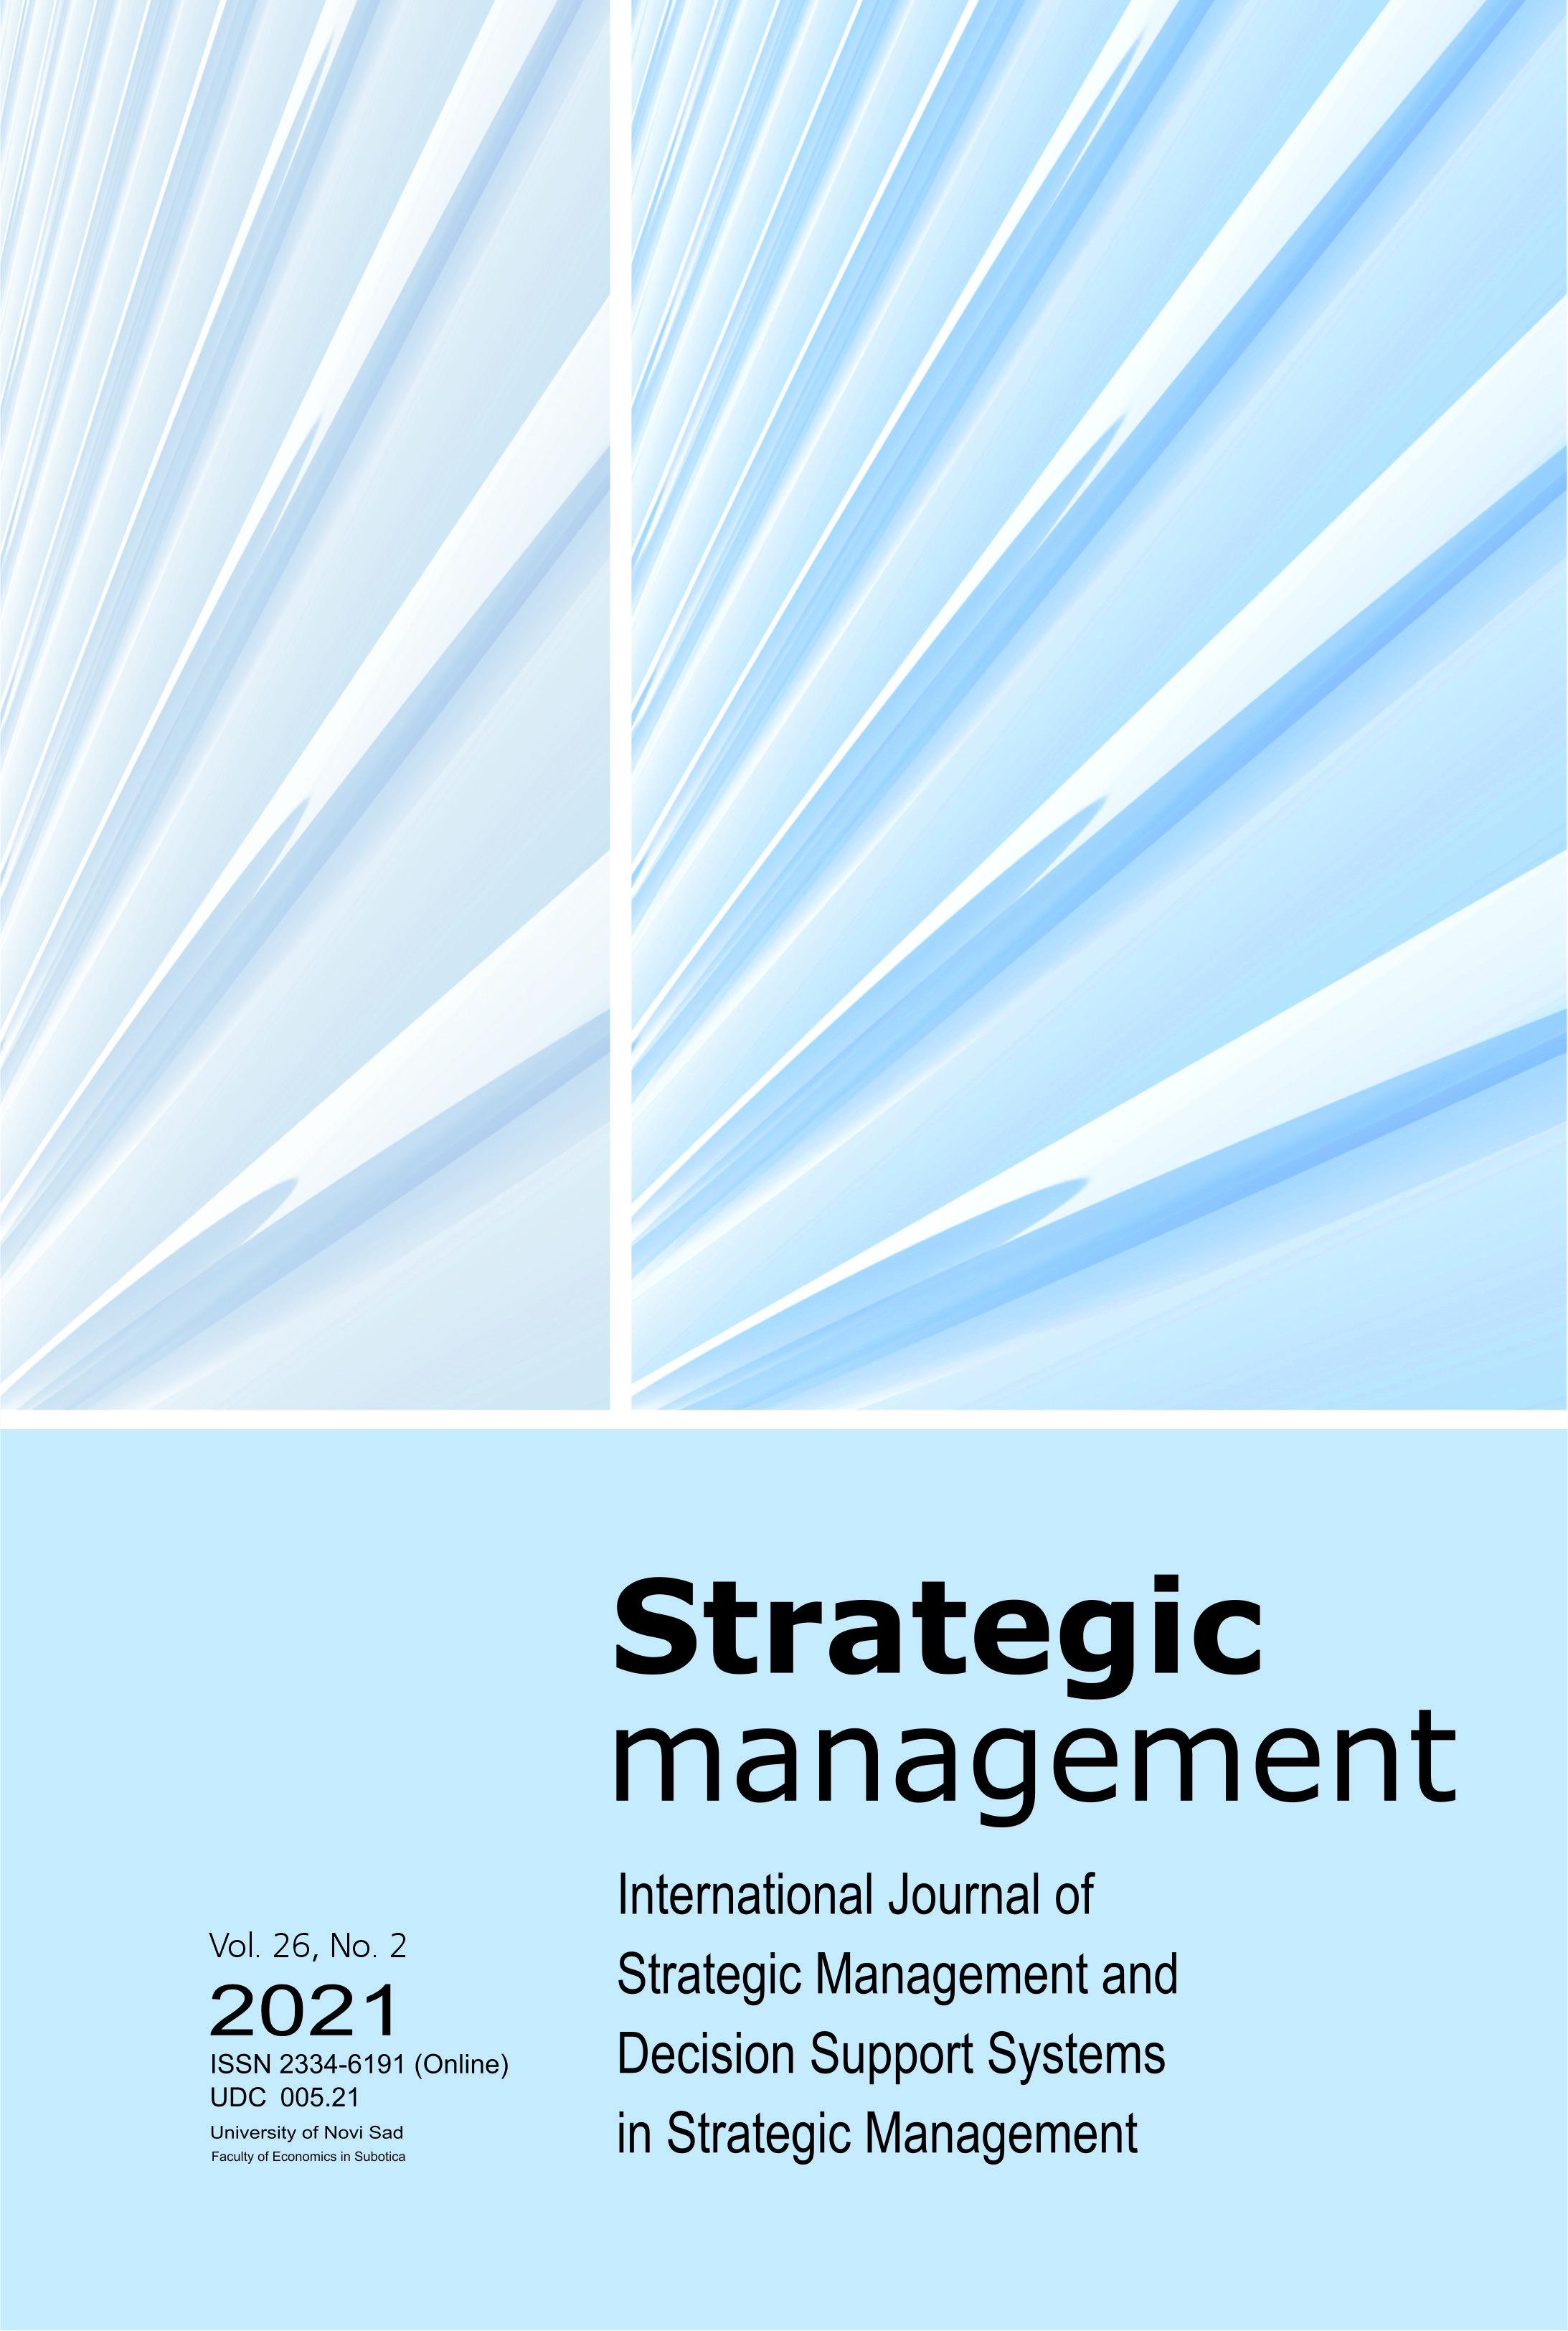 View Vol. 26 No. 2 (2021): Strategic Management